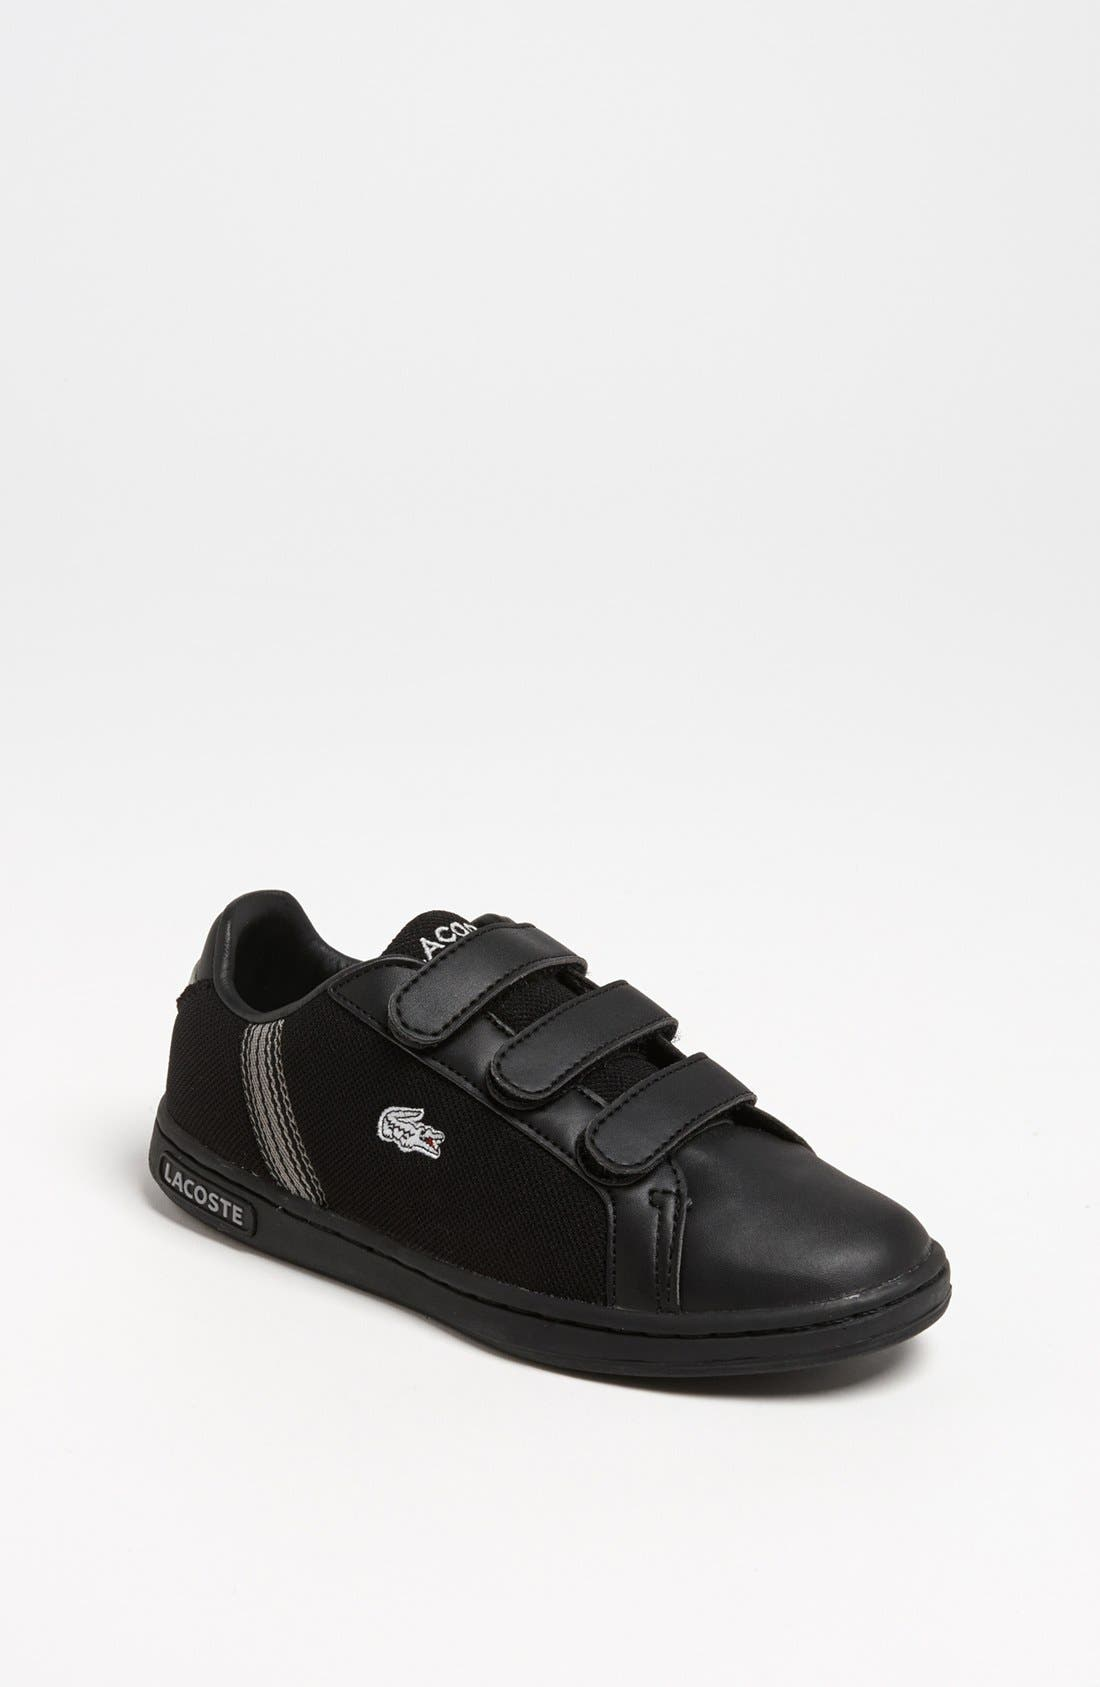 Alternate Image 1 Selected - Lacoste 'Renard' Sneaker (Toddler & Little Kid)